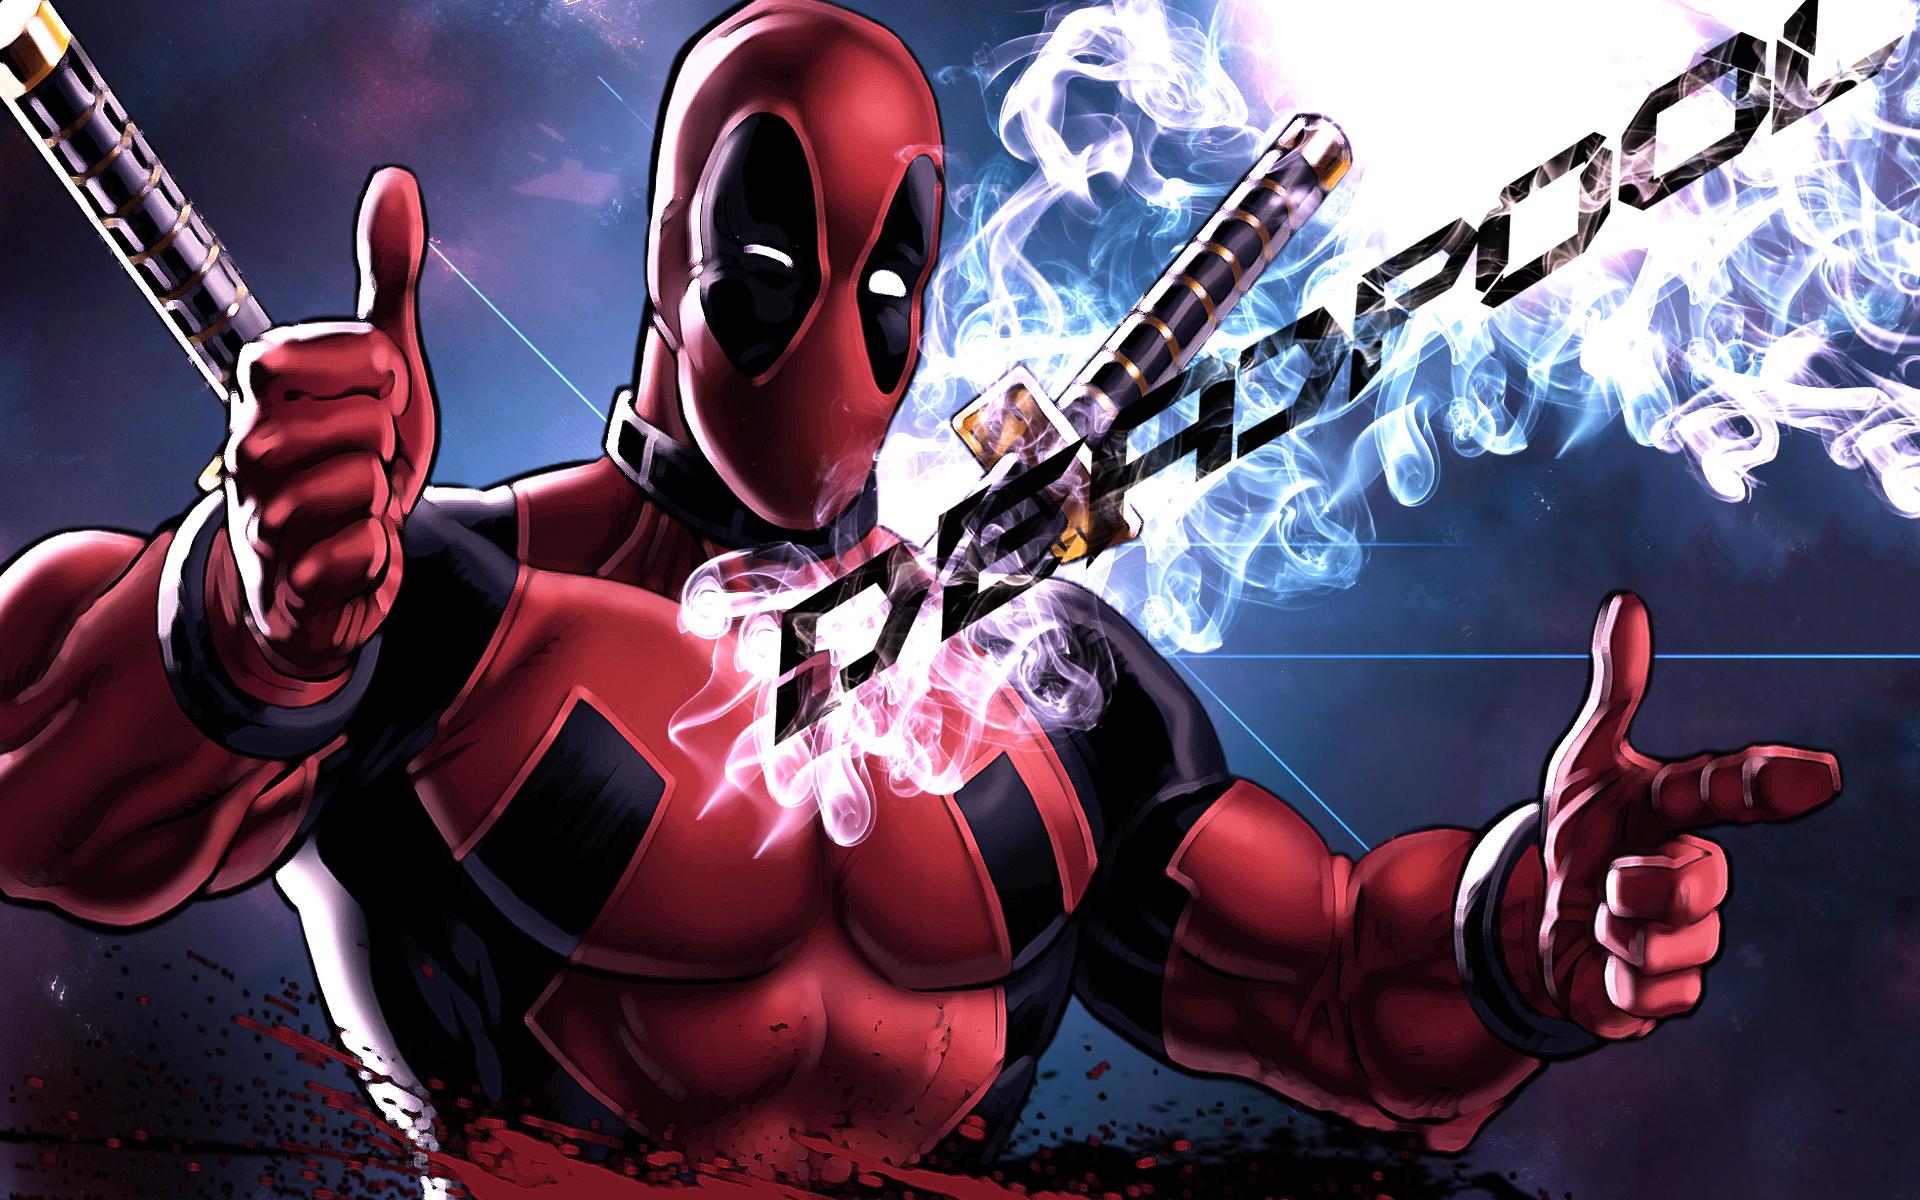 Cool Deadpool Wallpapers HD download 1920x1200